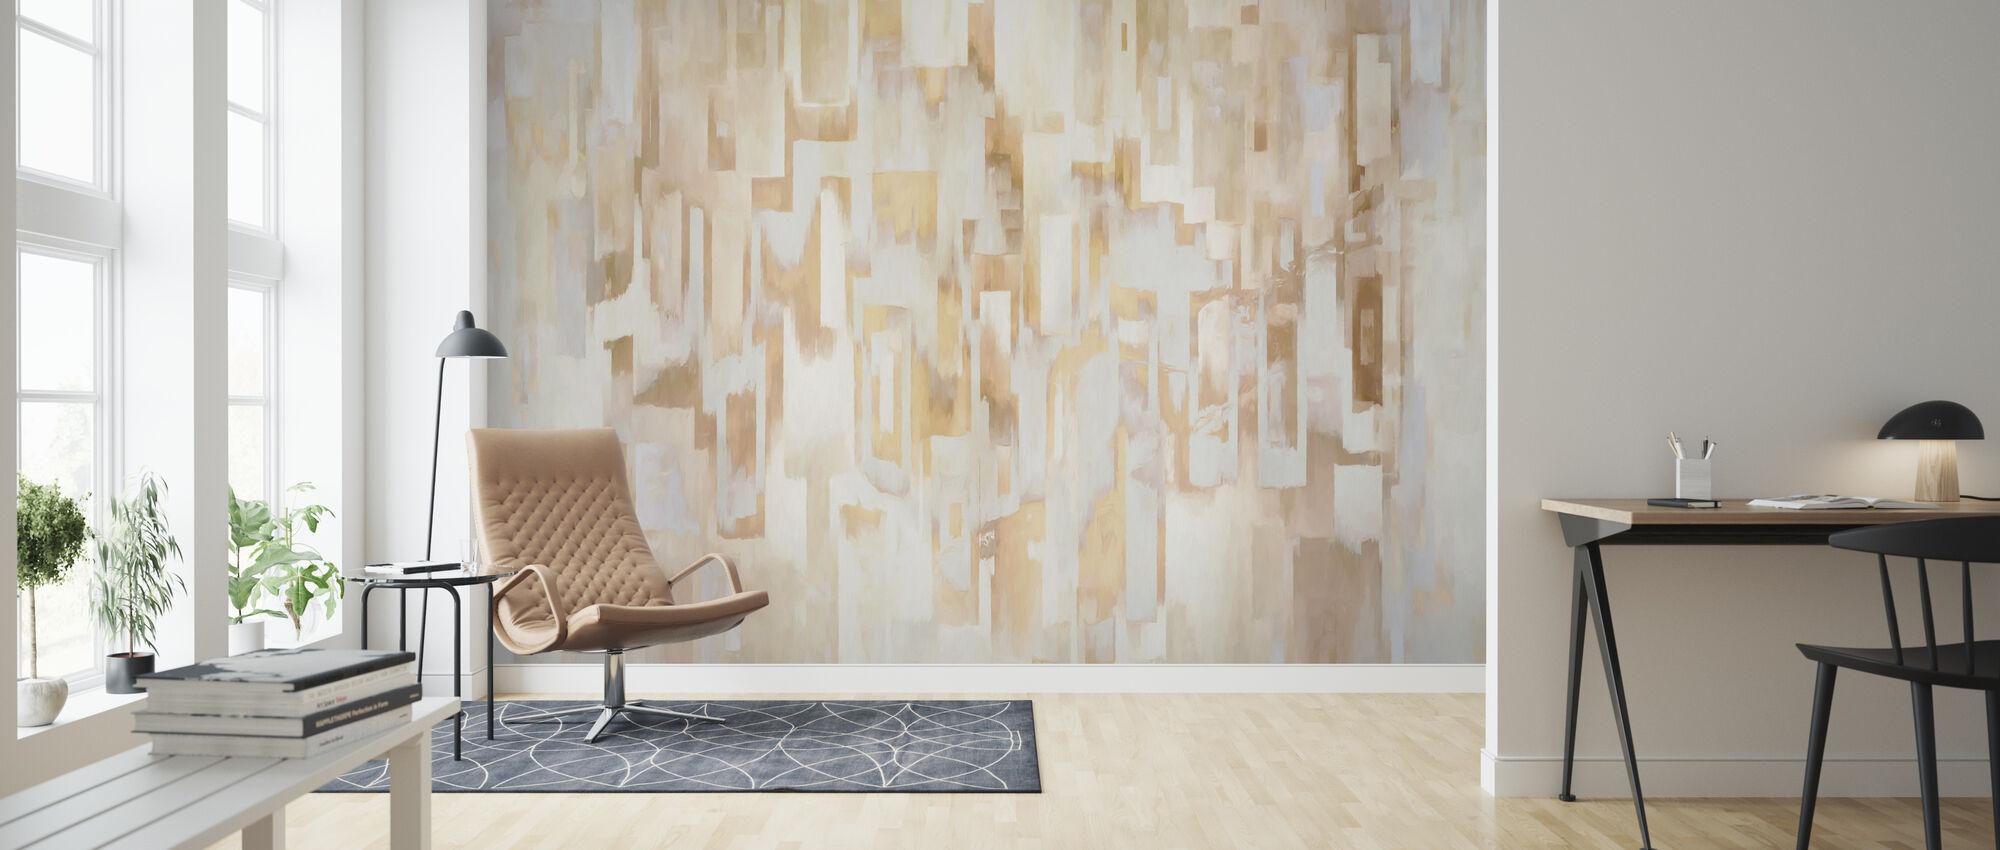 Mediterranean Villages Warm - Wallpaper - Living Room